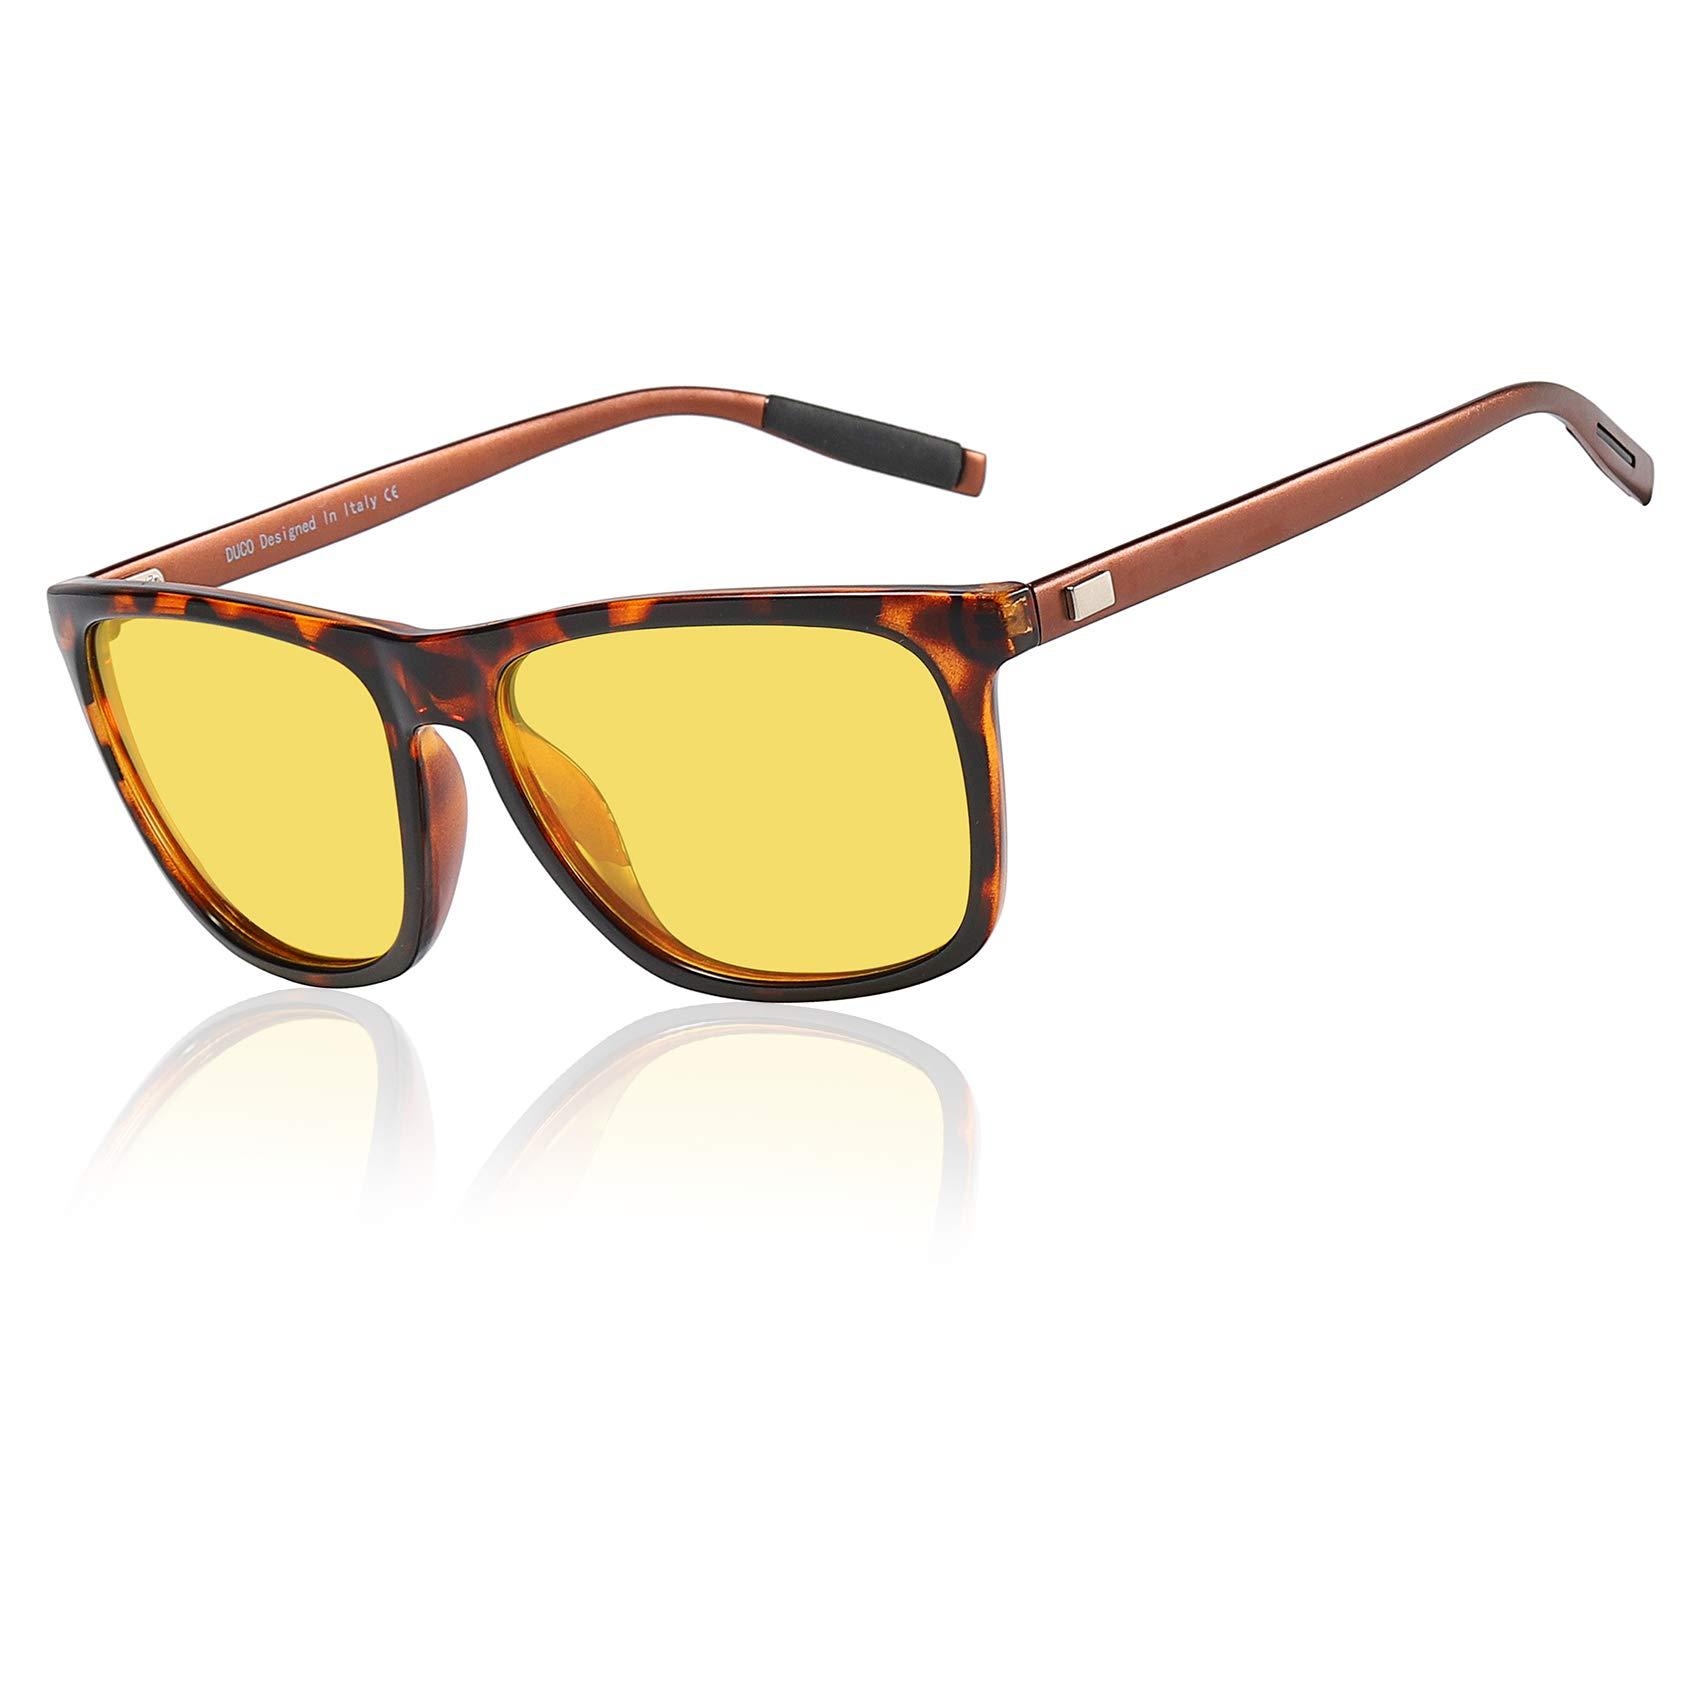 Driving Glasses Headlight Anti glare Tortoise